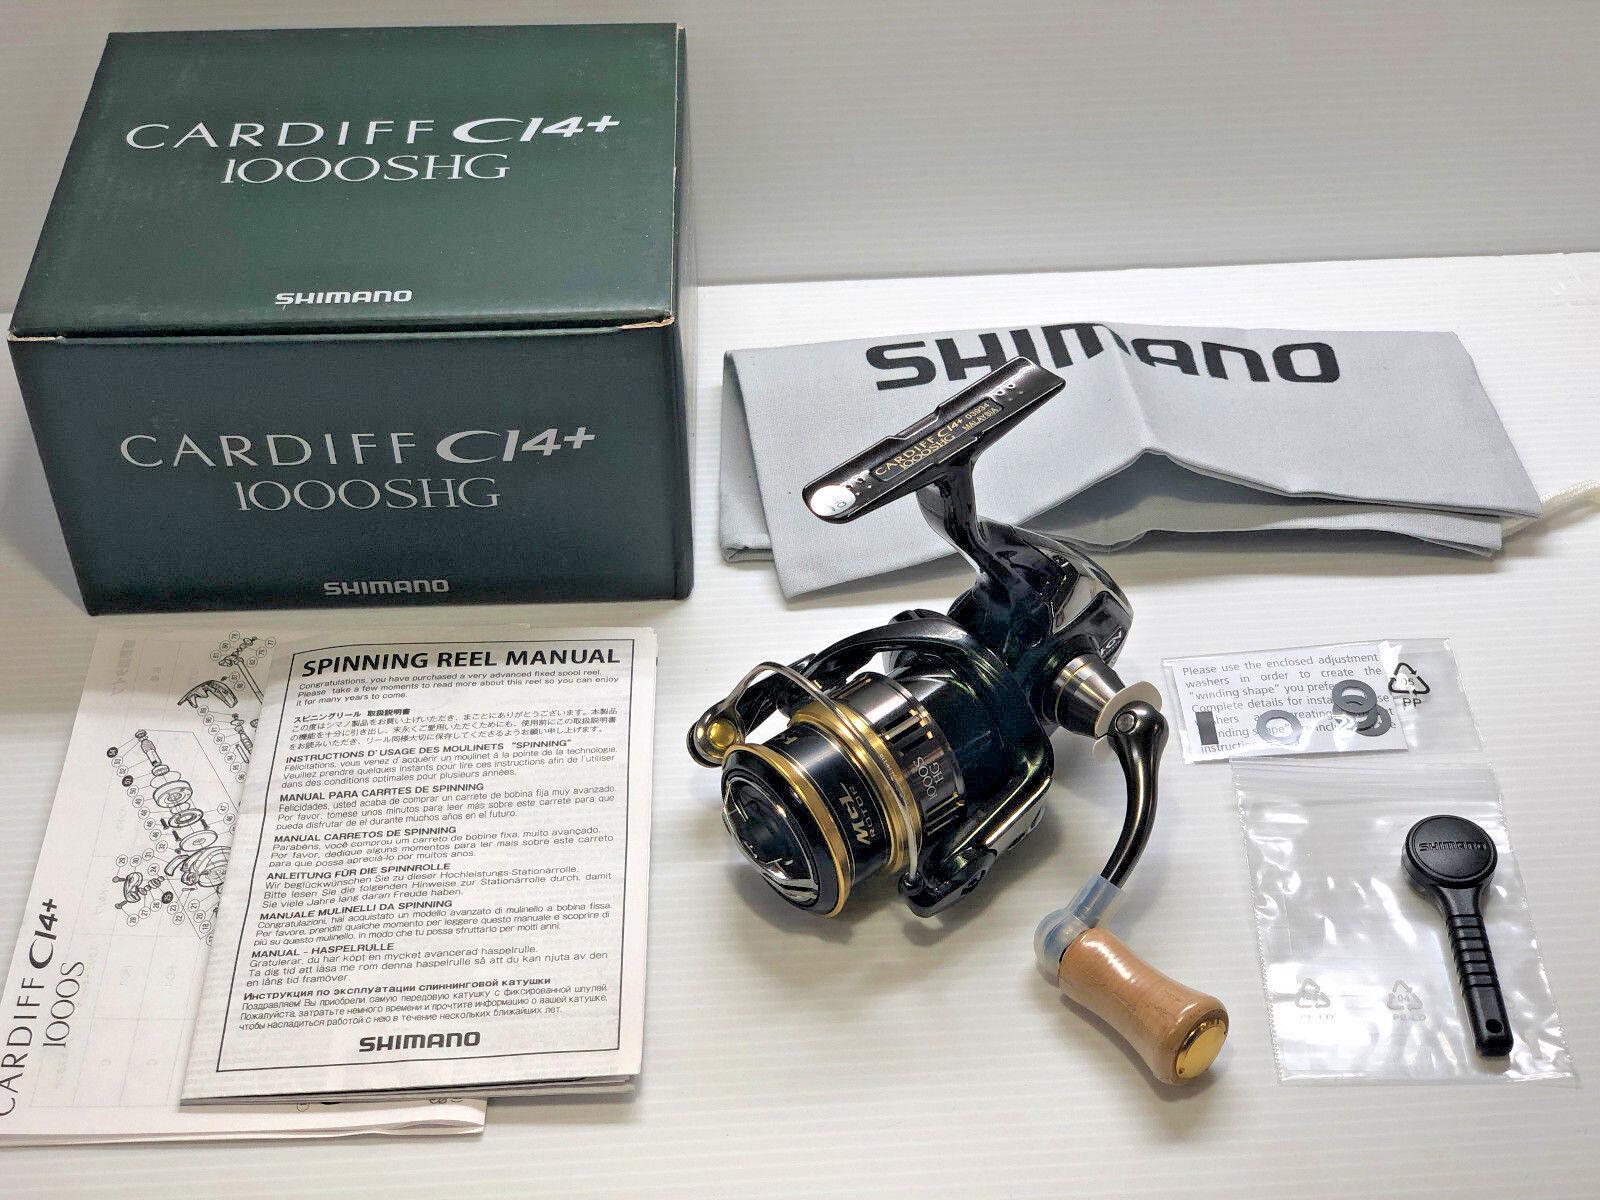 SHIMANO 18 CARDIFF CI4+1000SHG   - Free Shipping from Japan